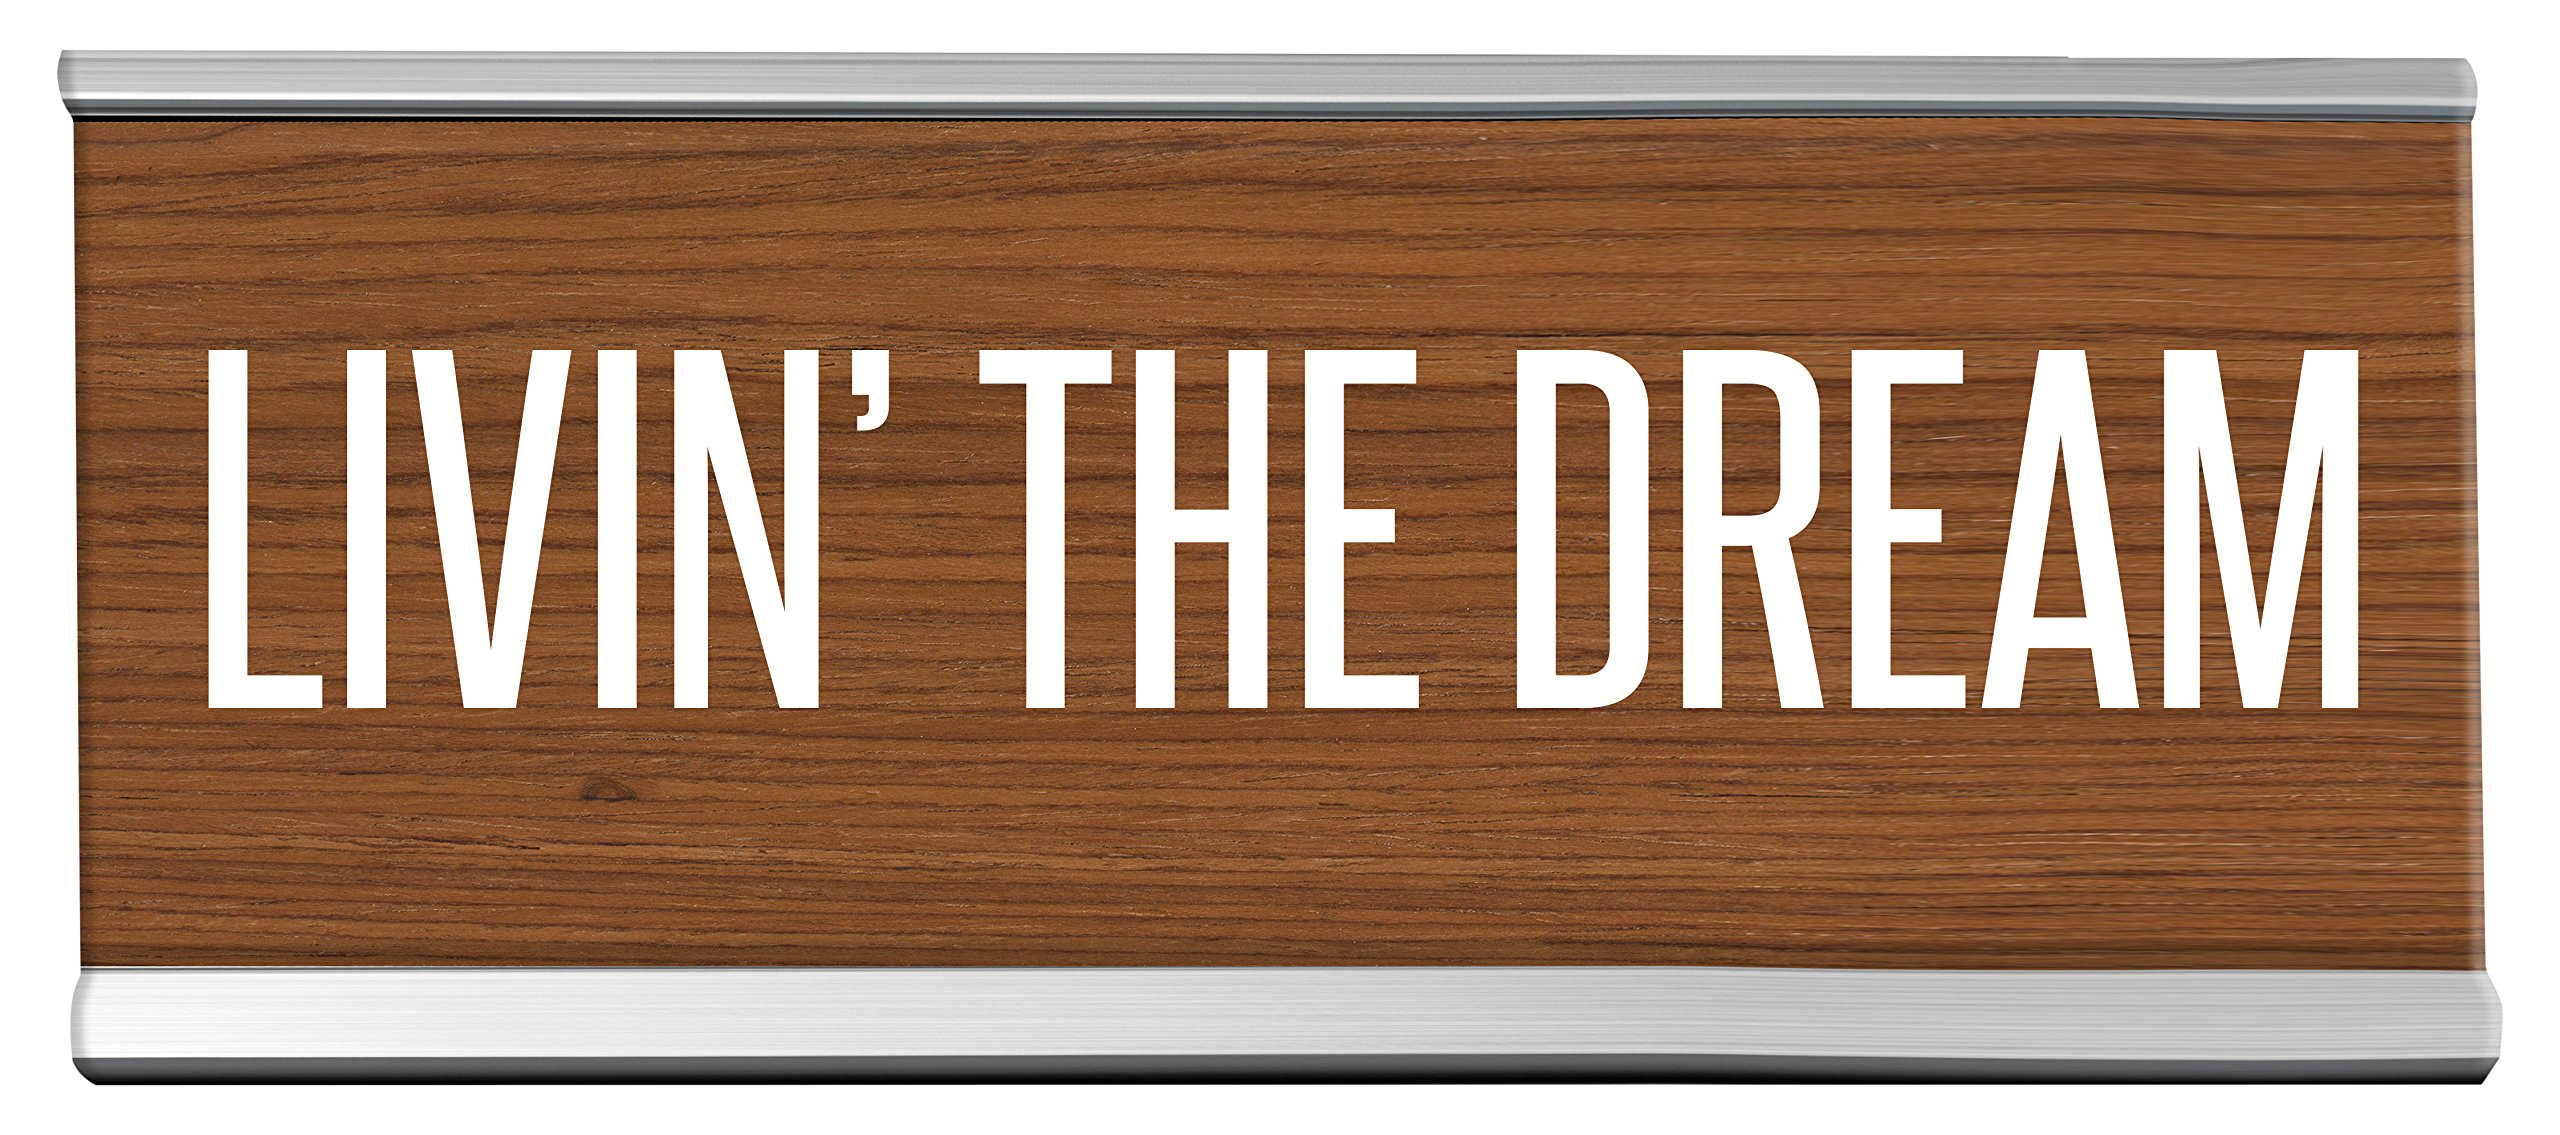 Livin The Dream Desk Sign, 8 inch x 2 inch, Brown